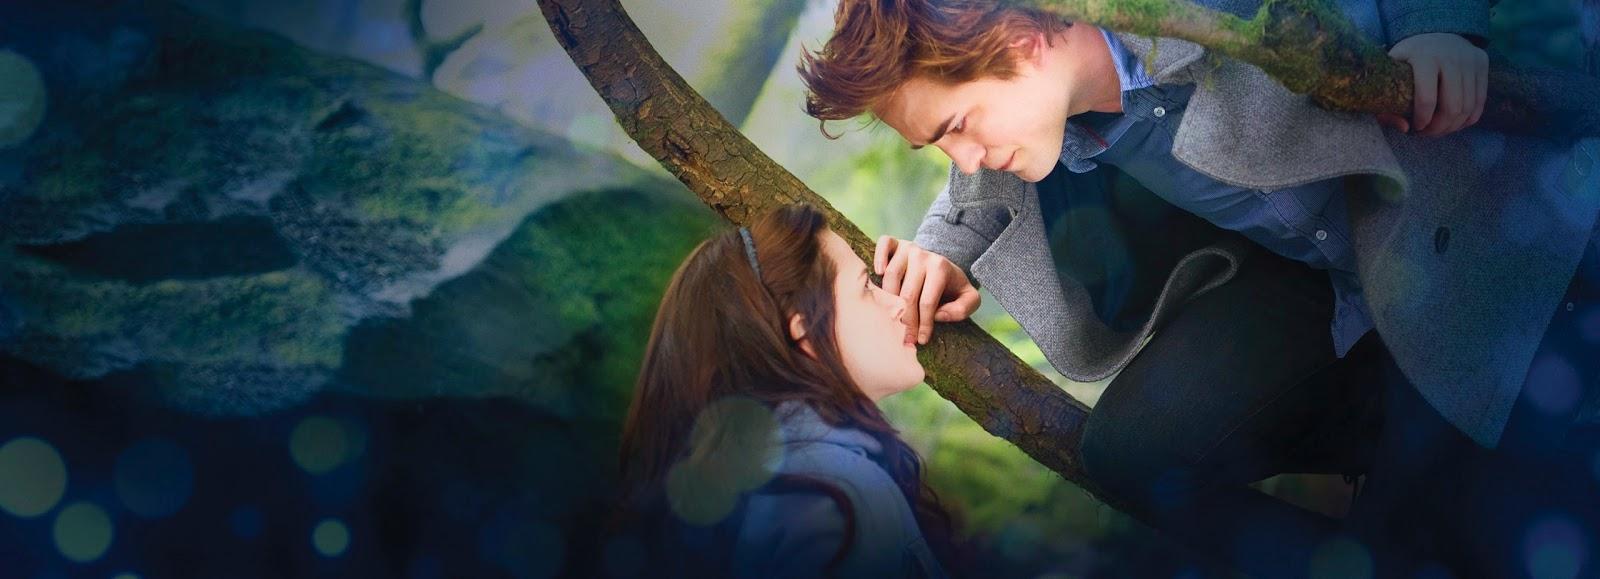 Free Twilight Saga Books